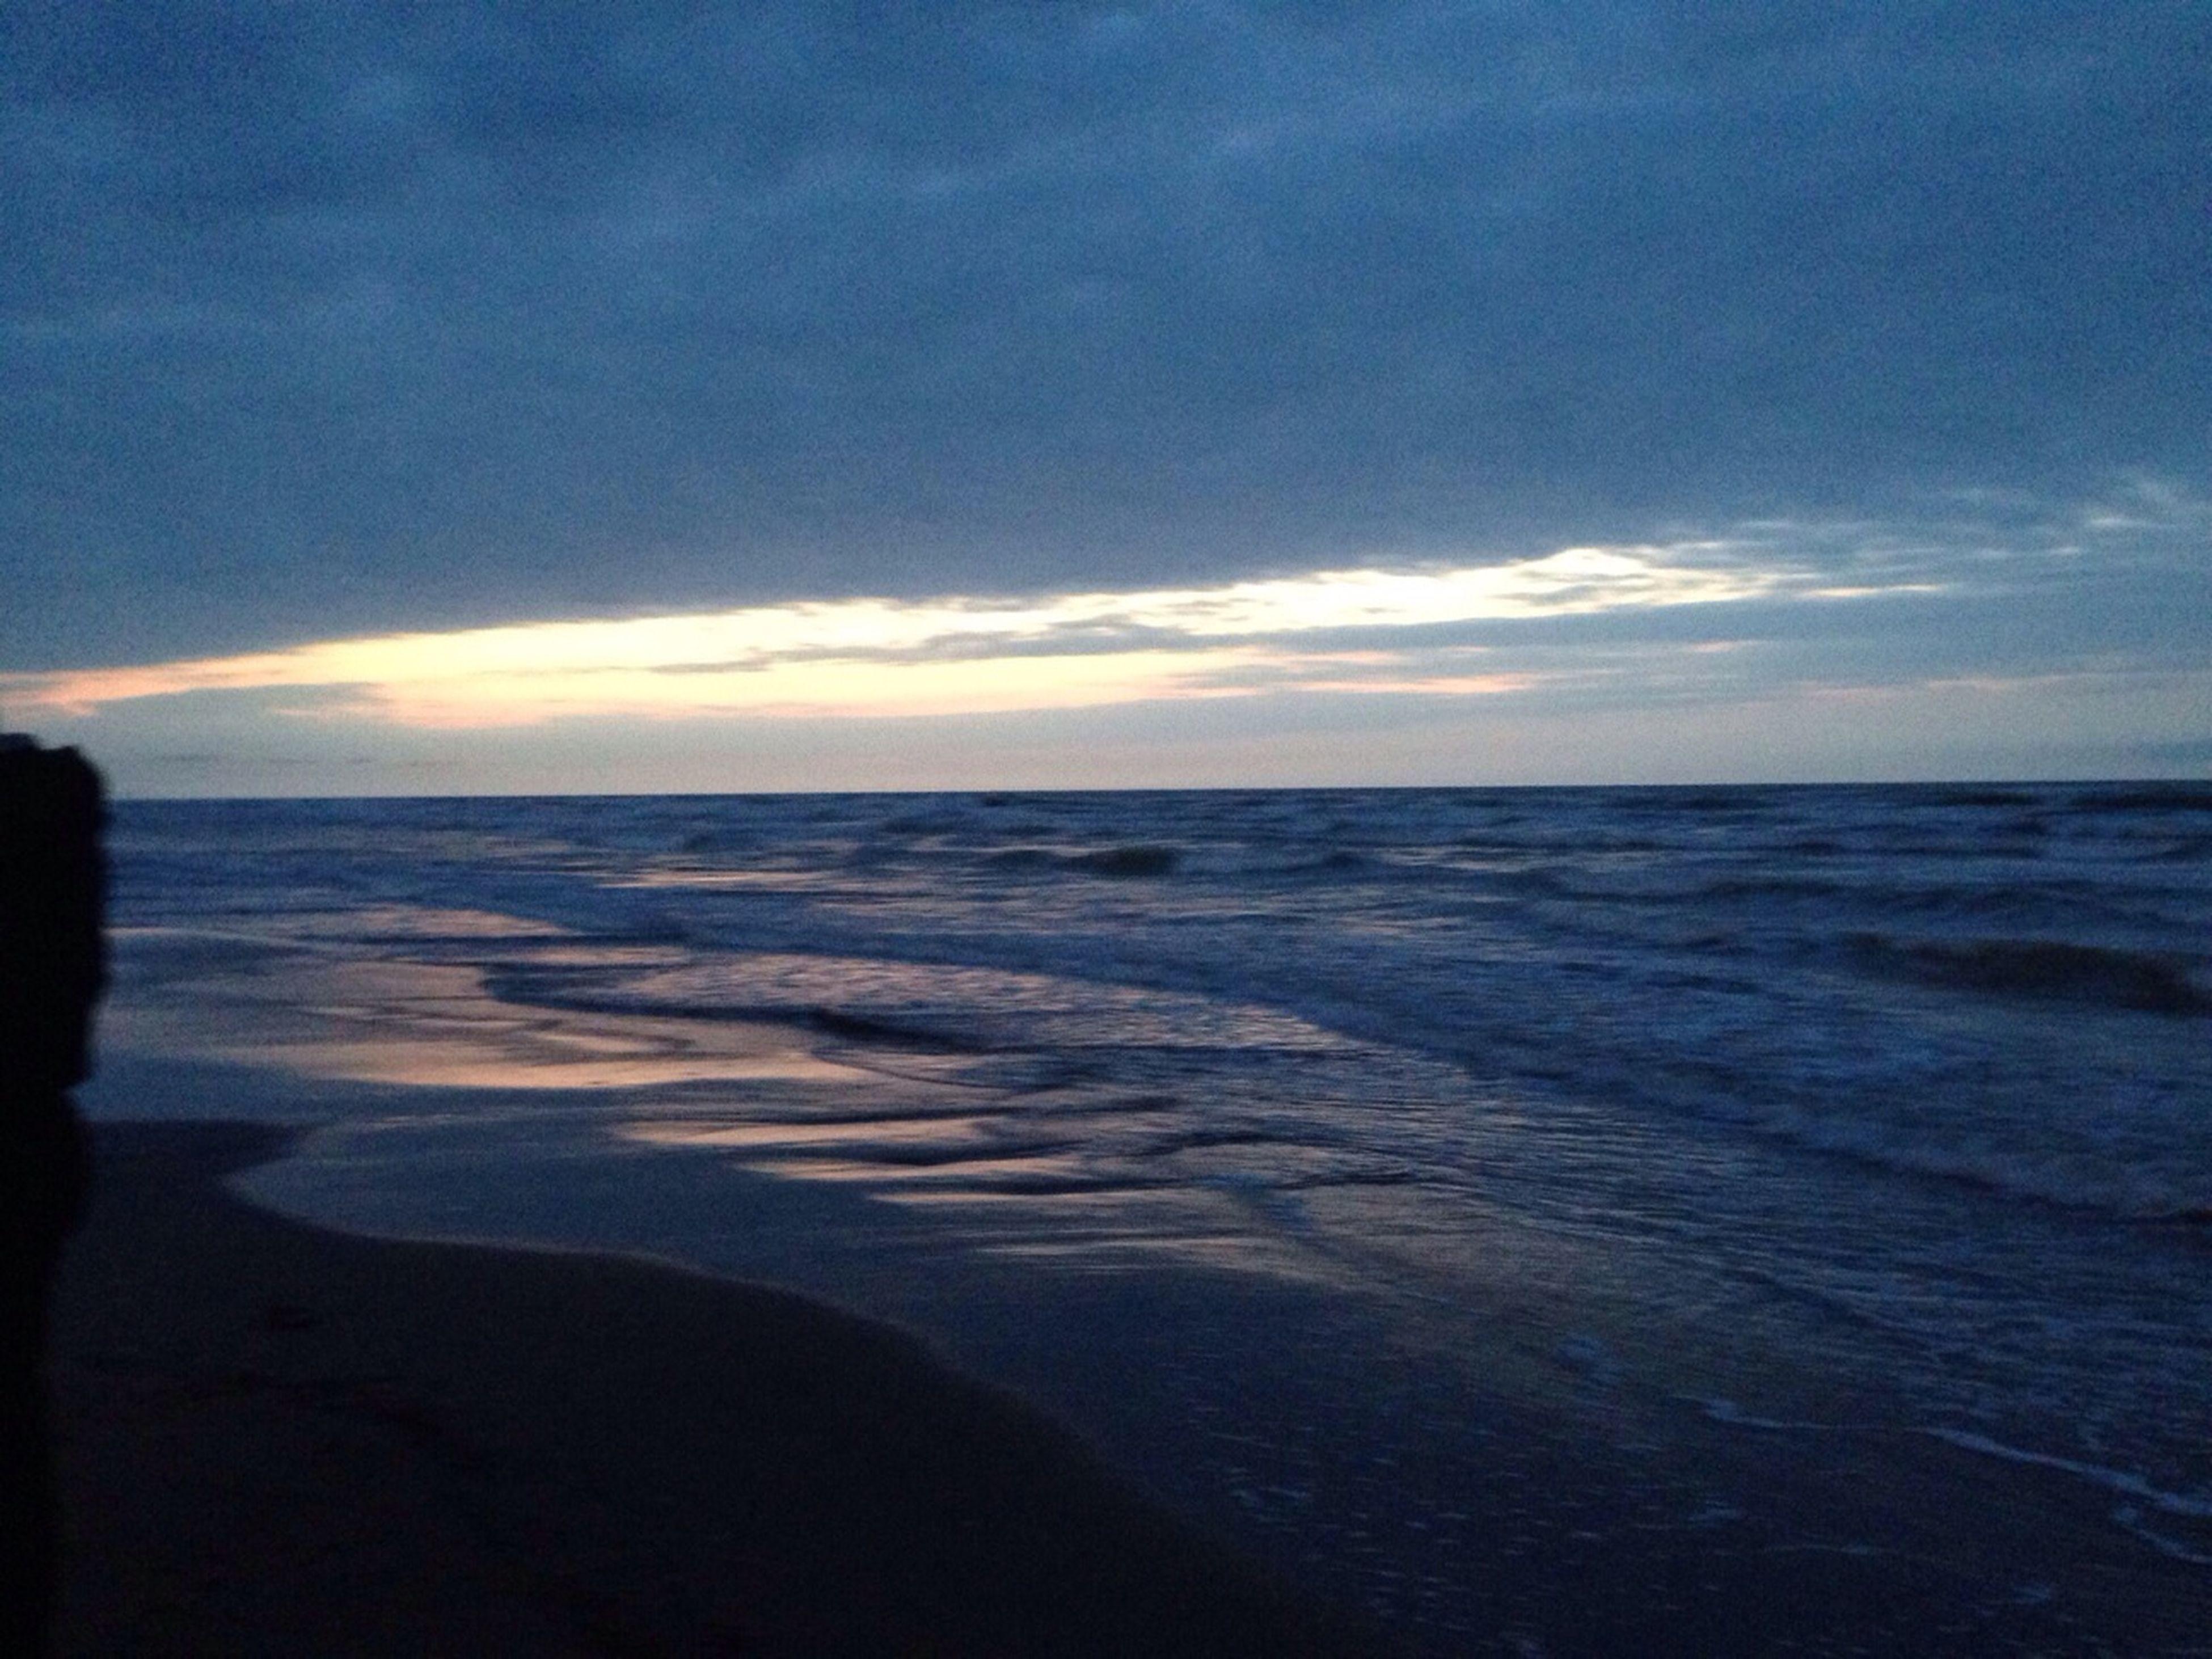 sea, horizon over water, beach, water, scenics, sky, tranquil scene, beauty in nature, tranquility, shore, wave, nature, sand, cloud - sky, sunset, idyllic, cloud, seascape, surf, coastline